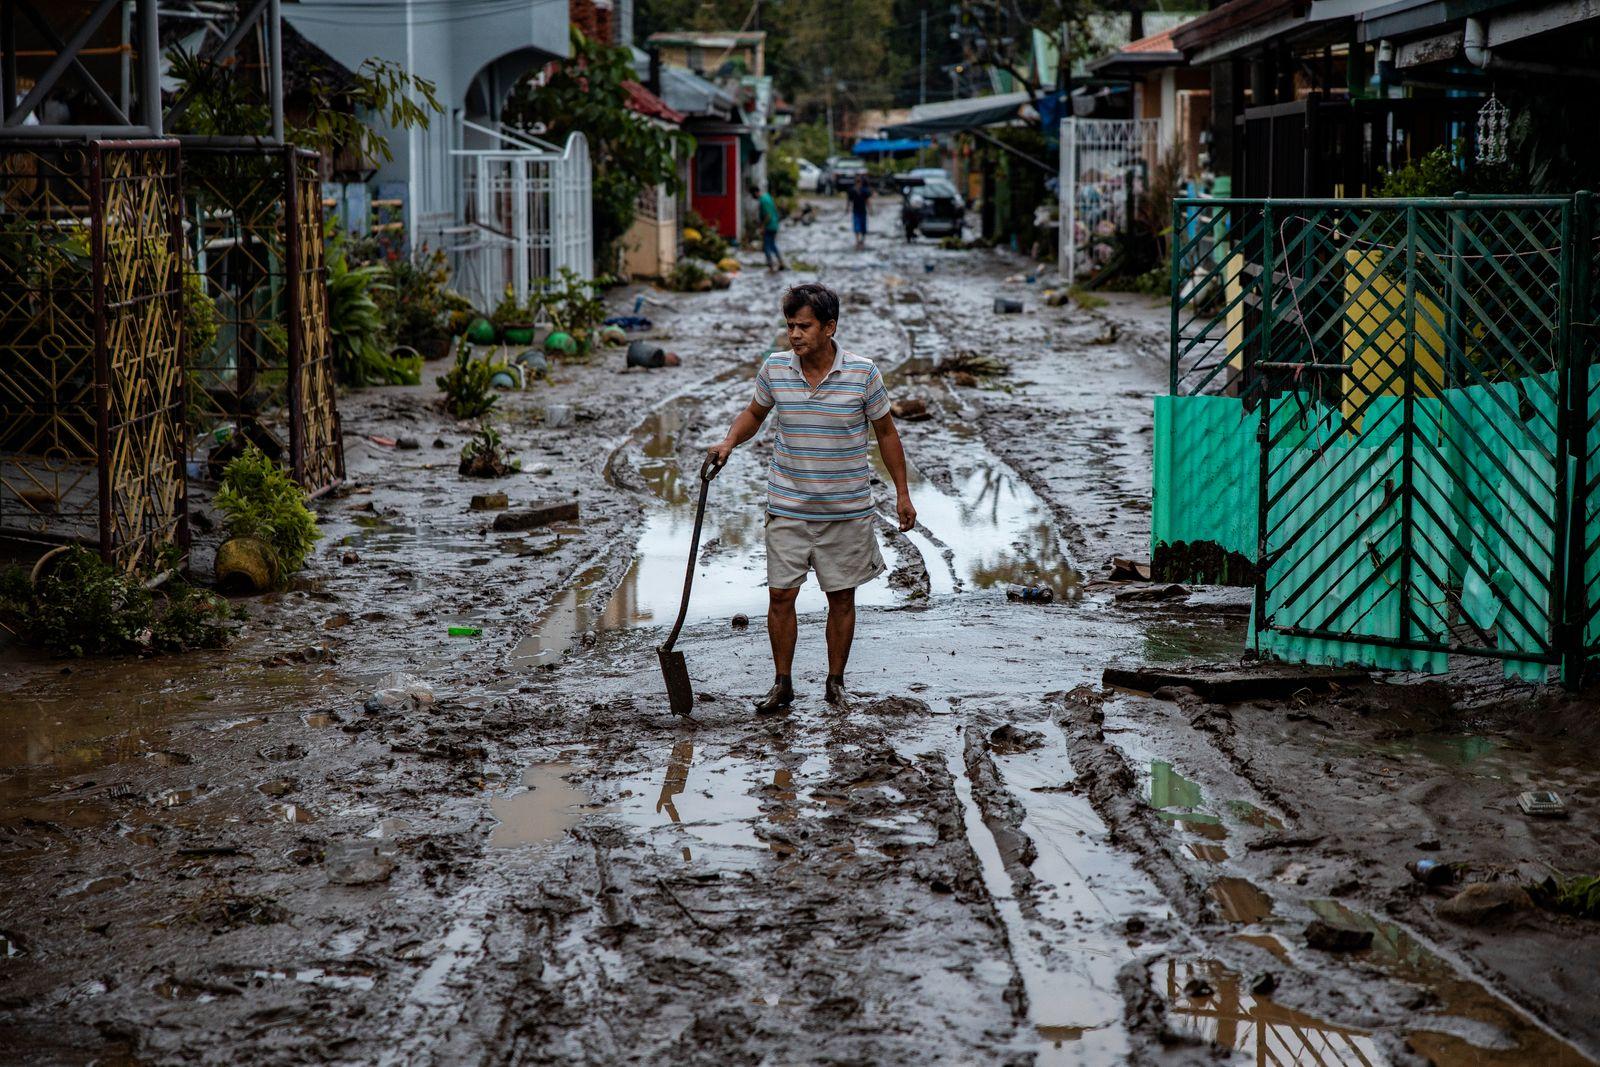 BESTPIX - Typhoon Goni Barrells Across The Philippines